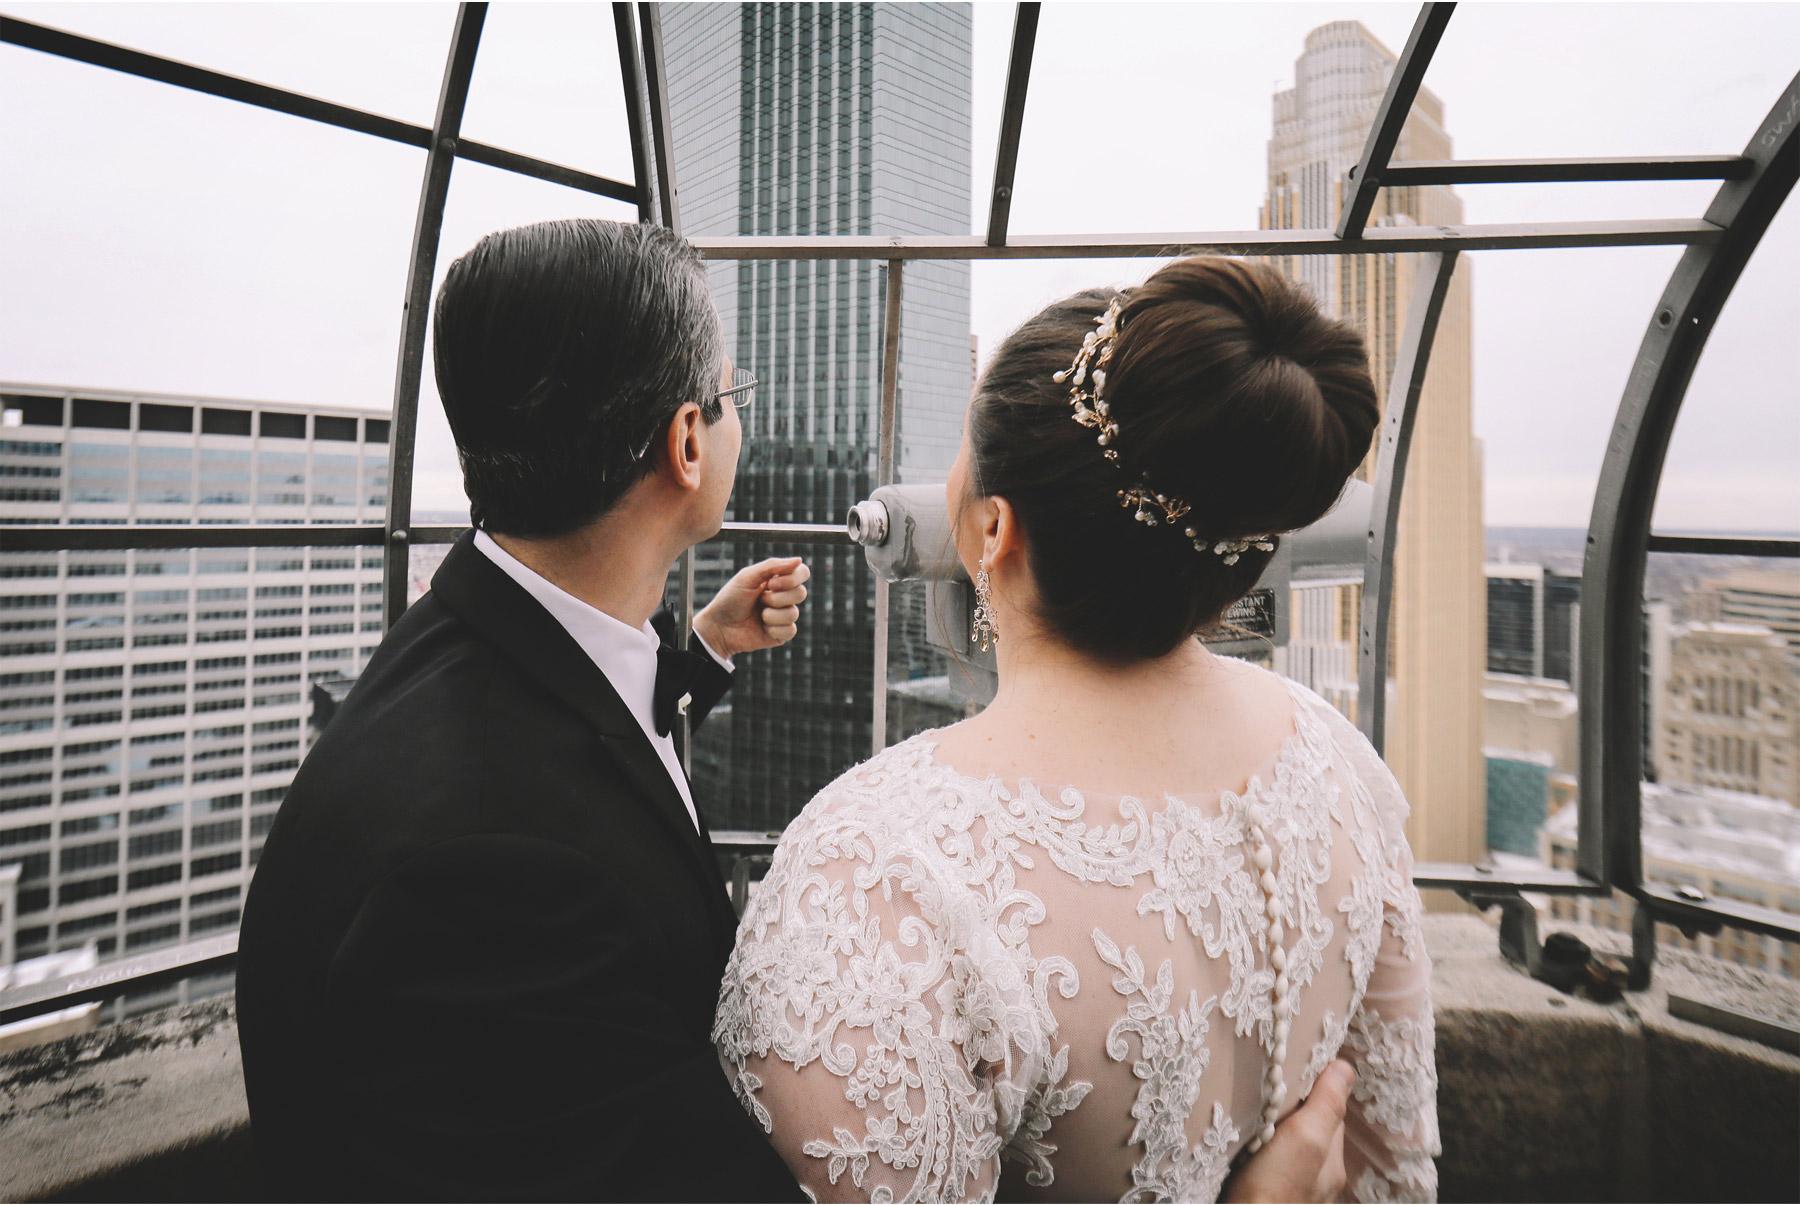 05-Minneapolis-Minnesota-Wedding-Photography-by-Vick-Photography-Foshay-Skyline-Anja-and-Waseem.jpg